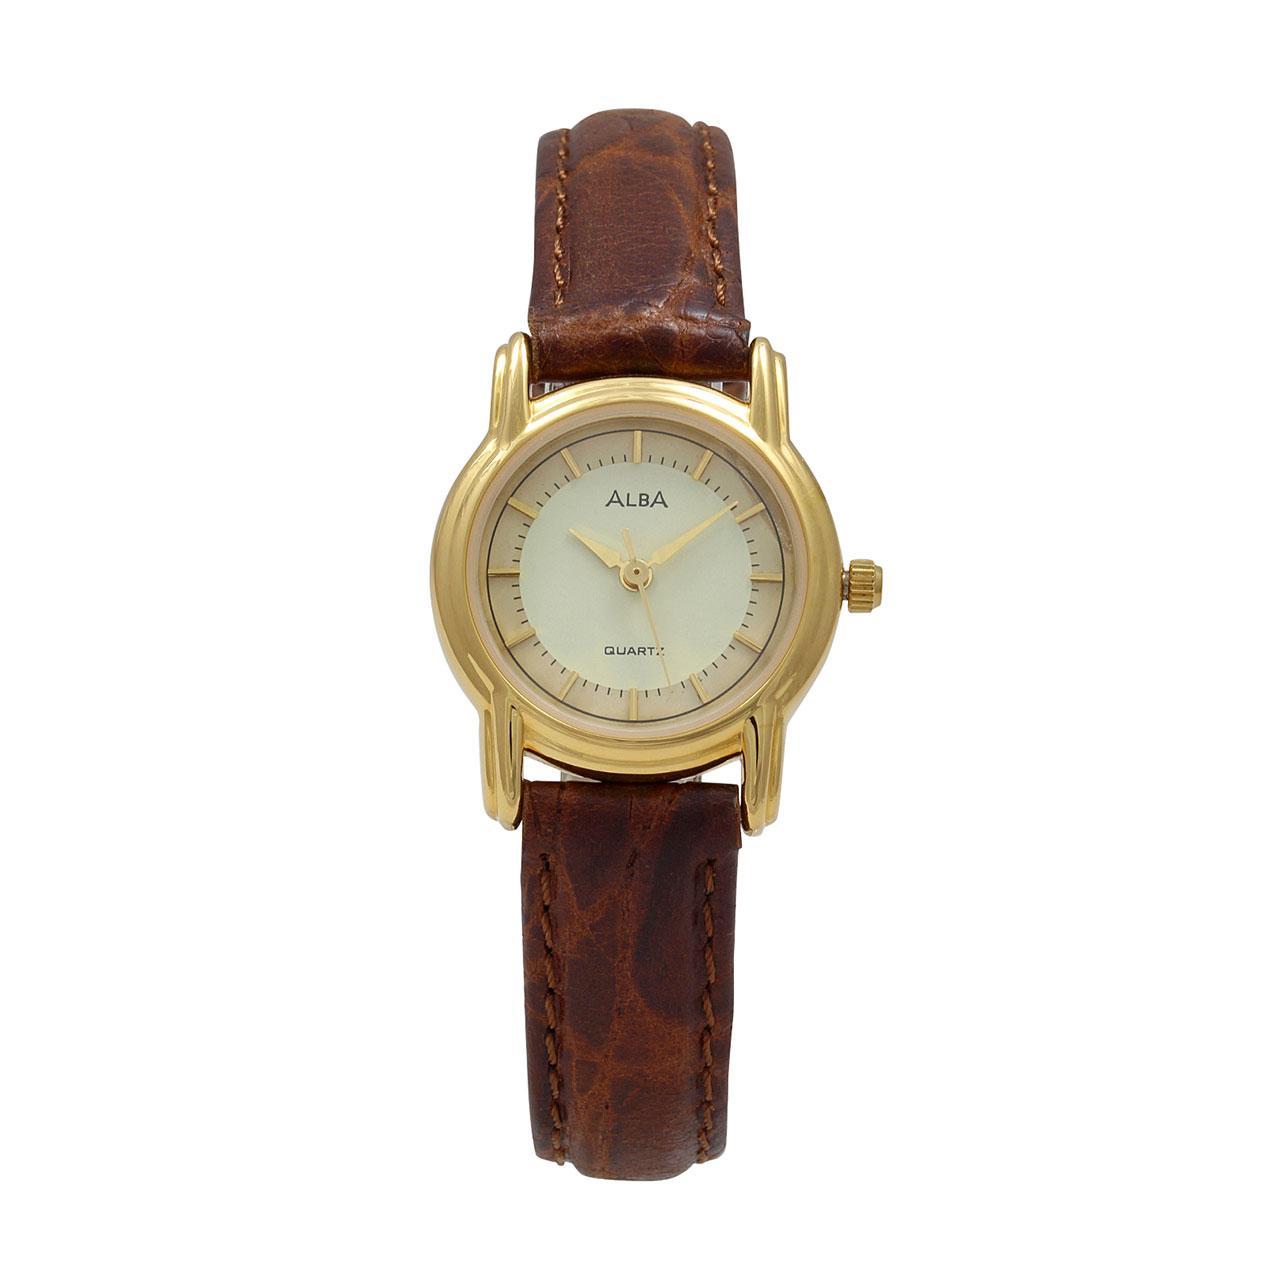 ALBA Jam Tangan Wanita - Brown Gold - Leather Strap - ATCX58